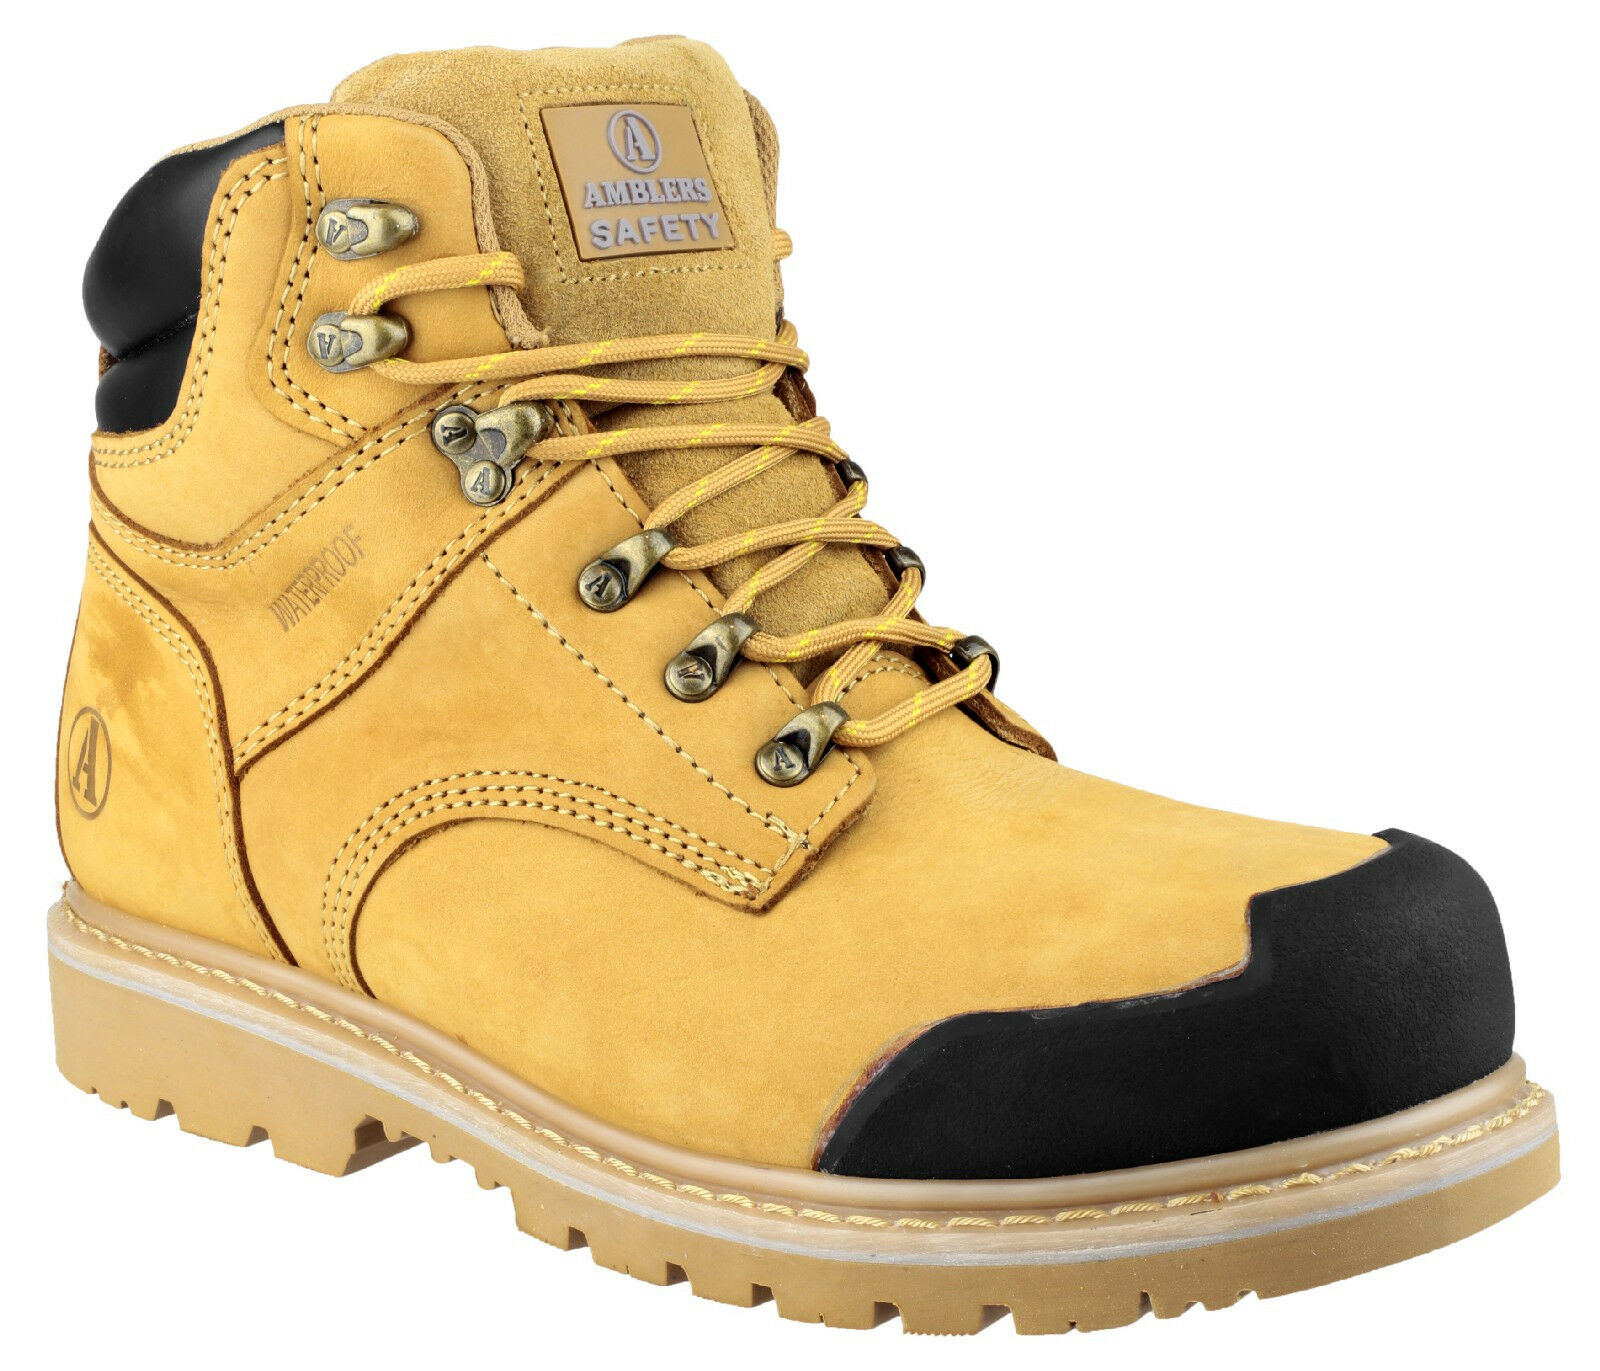 Linea Uomo Impermeabili Stivali di Sicurezza/Tan Brown in acciaio Puntale Work Boots laced Amblers